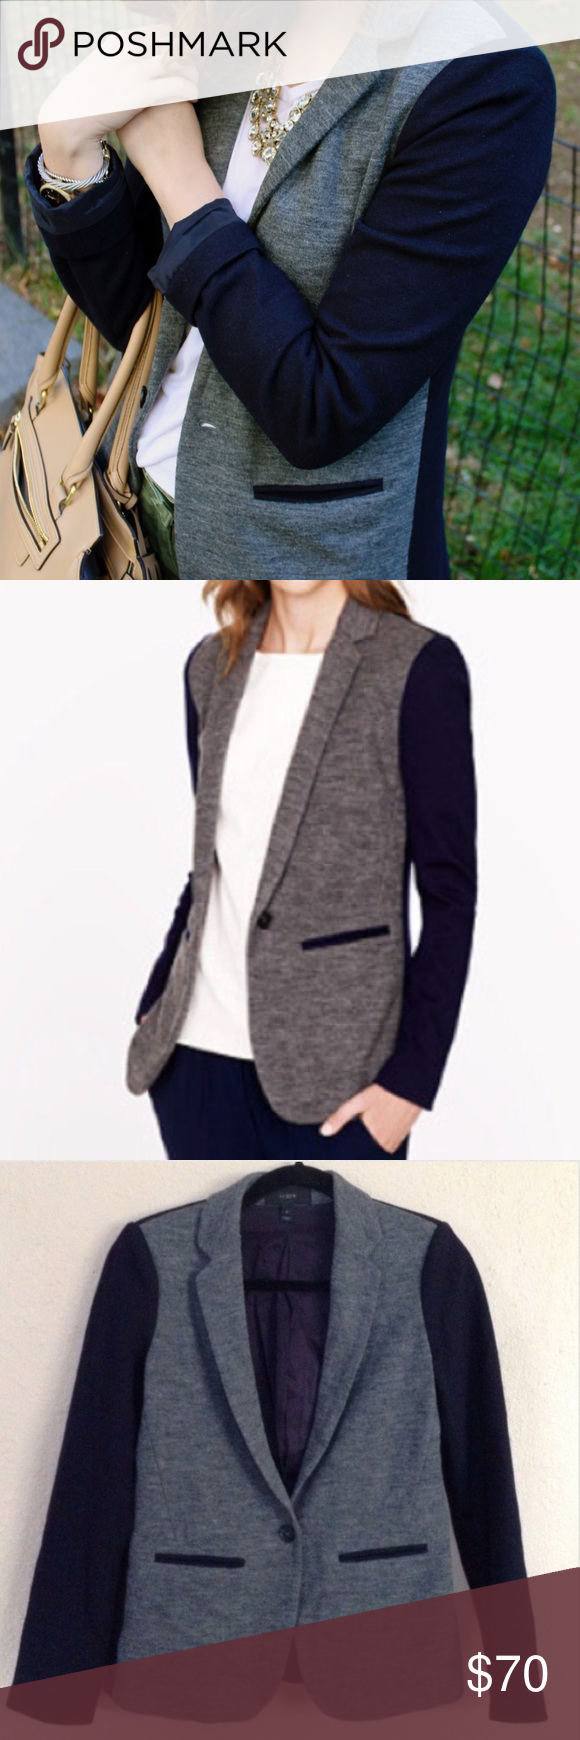 Spotted while shopping on Poshmark: J.Crew Gray & Navy Colorblock Slim Blazer! #poshmark #fashion #shopping #style #J. Crew #Jackets & Blazers